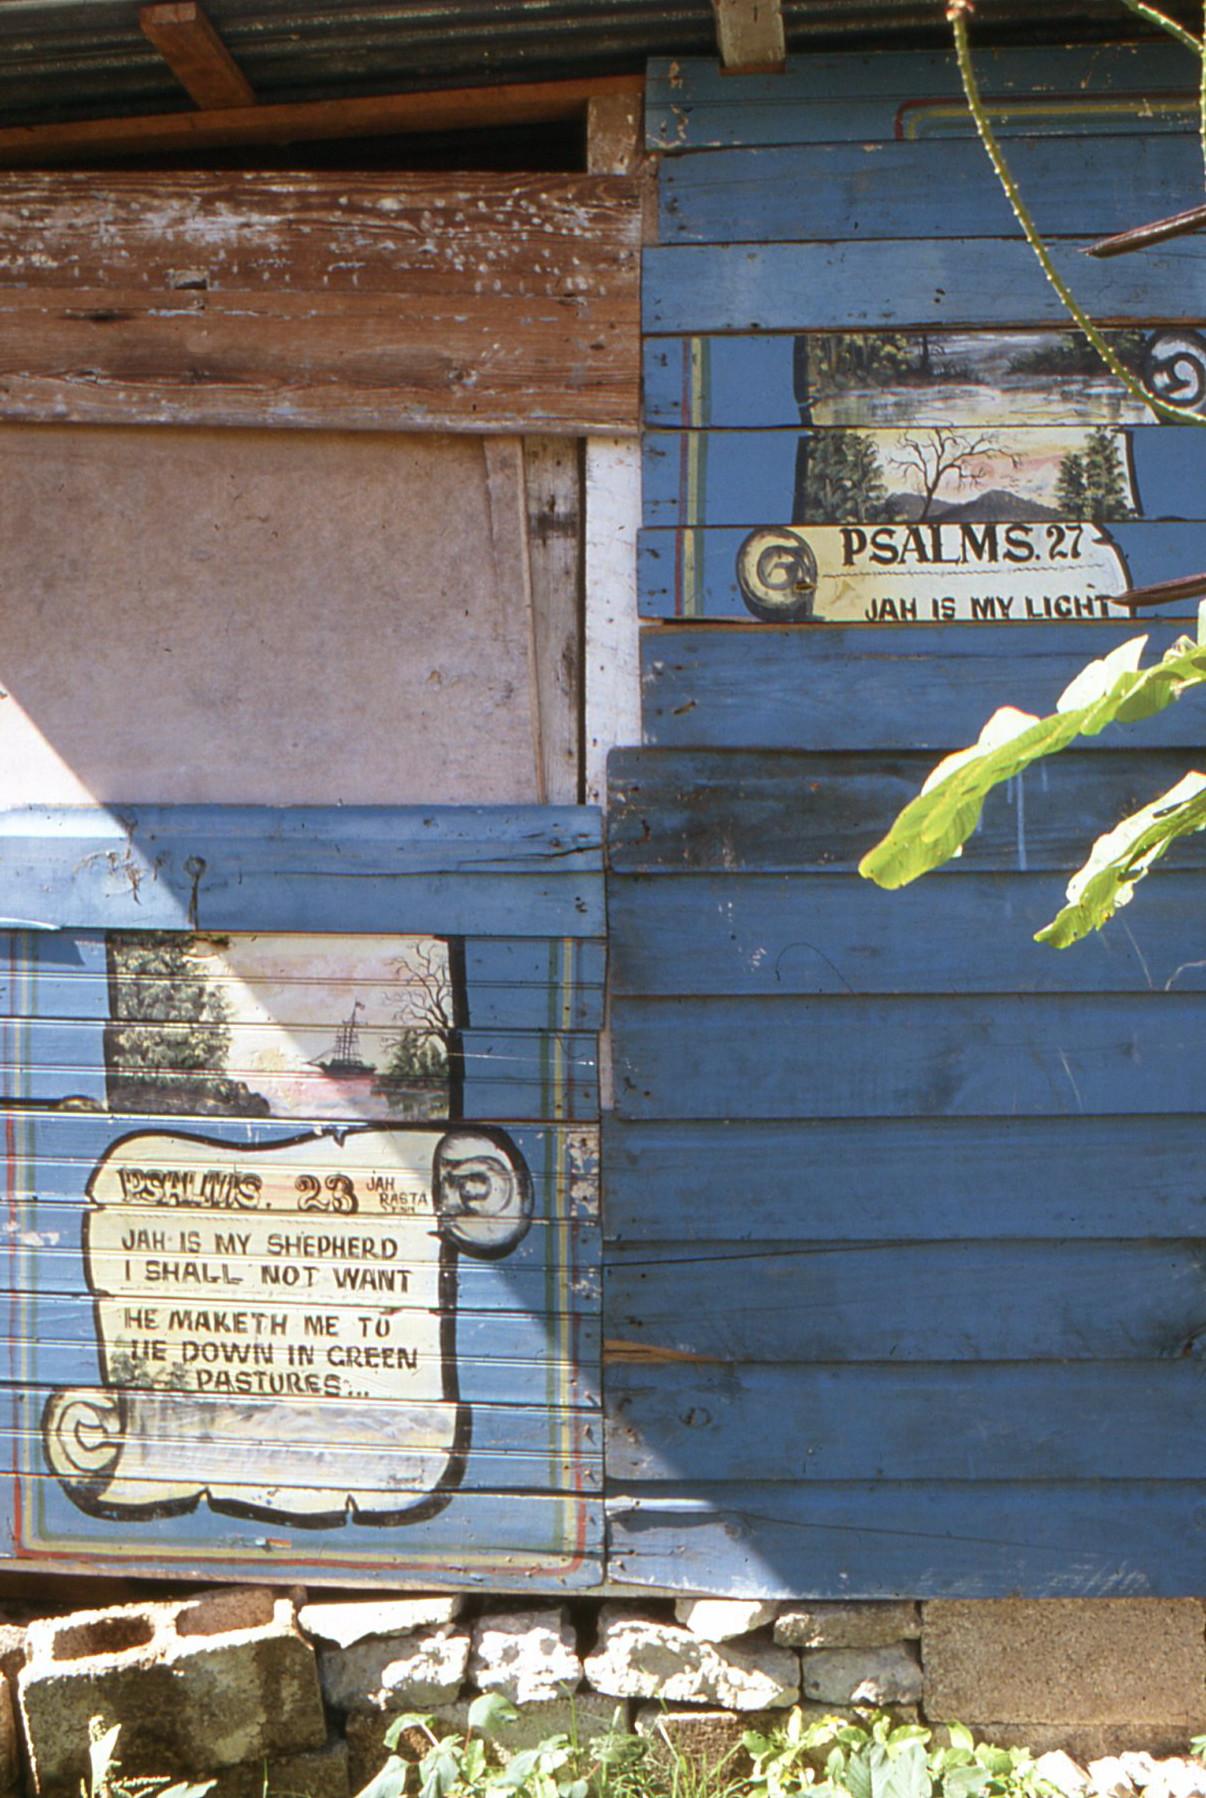 The Psalmist speaks, on Port Antonio's Titchfield Peninsula, set along Jamaica's East Coast.